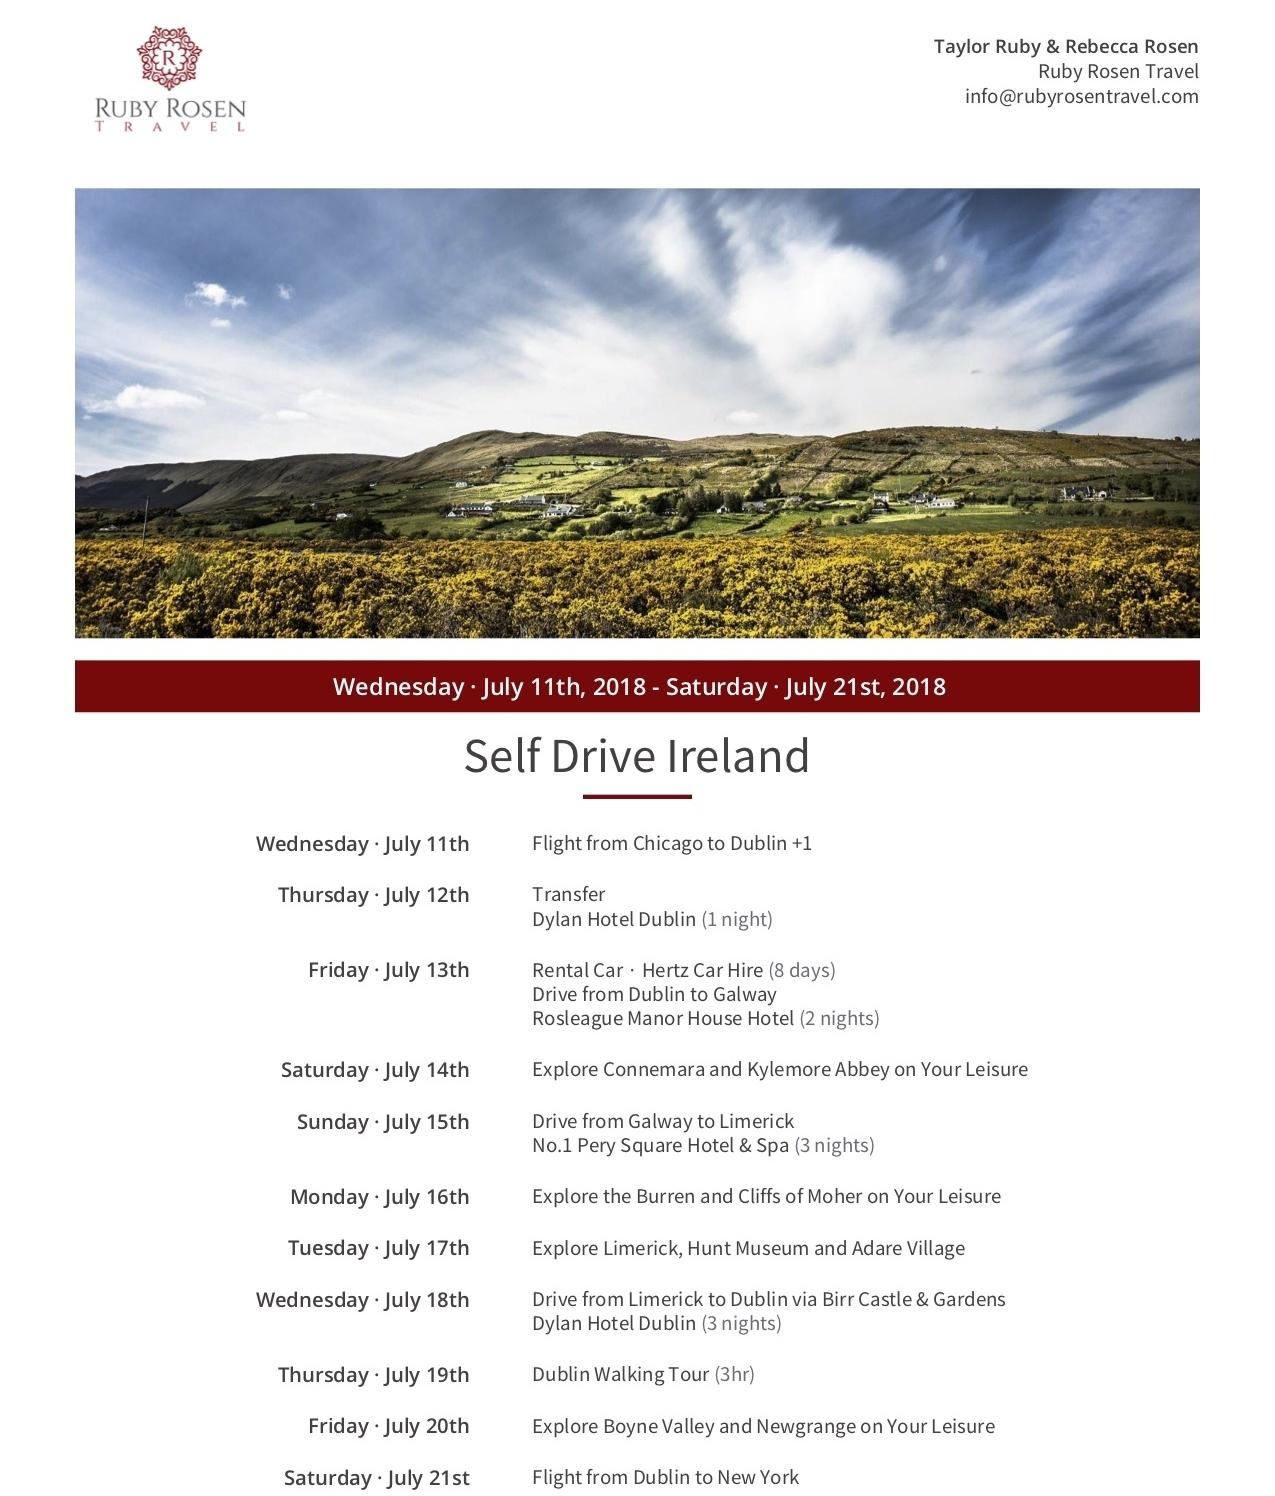 Self Drive Ireland 1.jpg